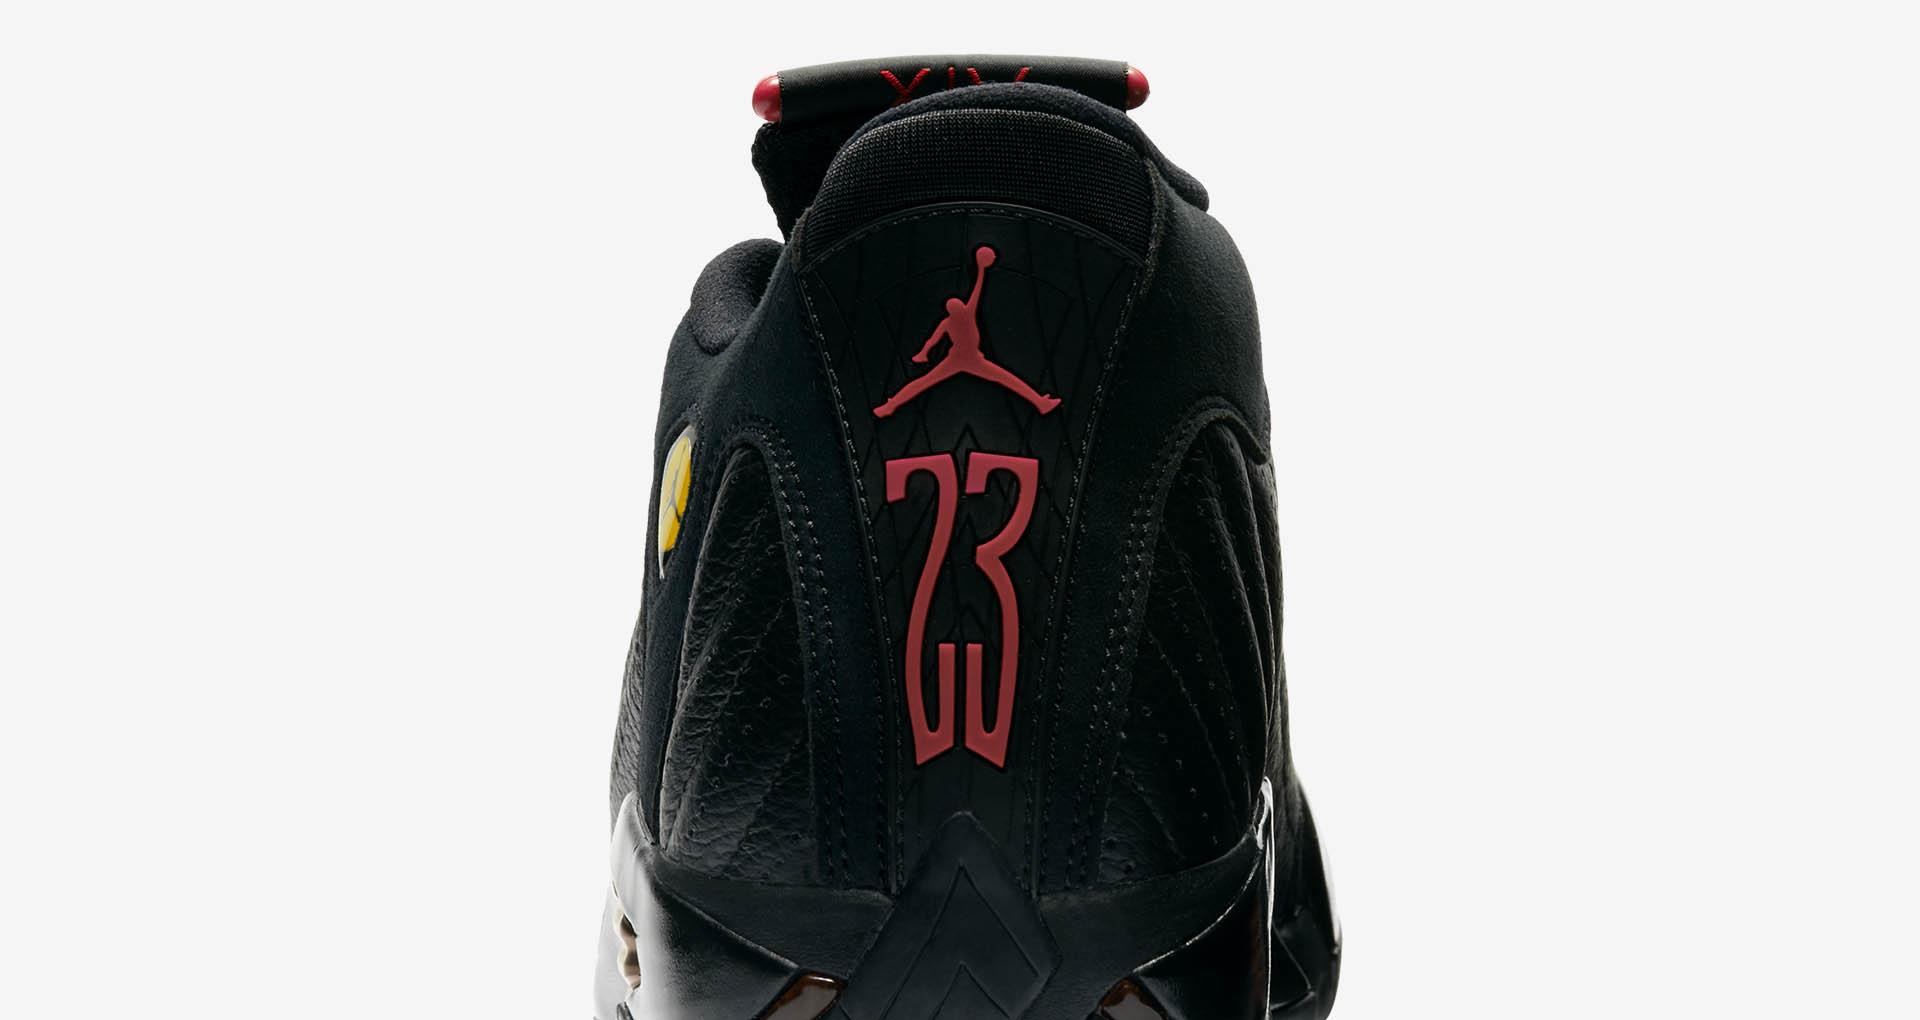 487471-003,AJ14,Air Jordan 14, 487471-003AJ14 今早突然上架!你买到今天的 Air Jordan 14 最后一投了吗?